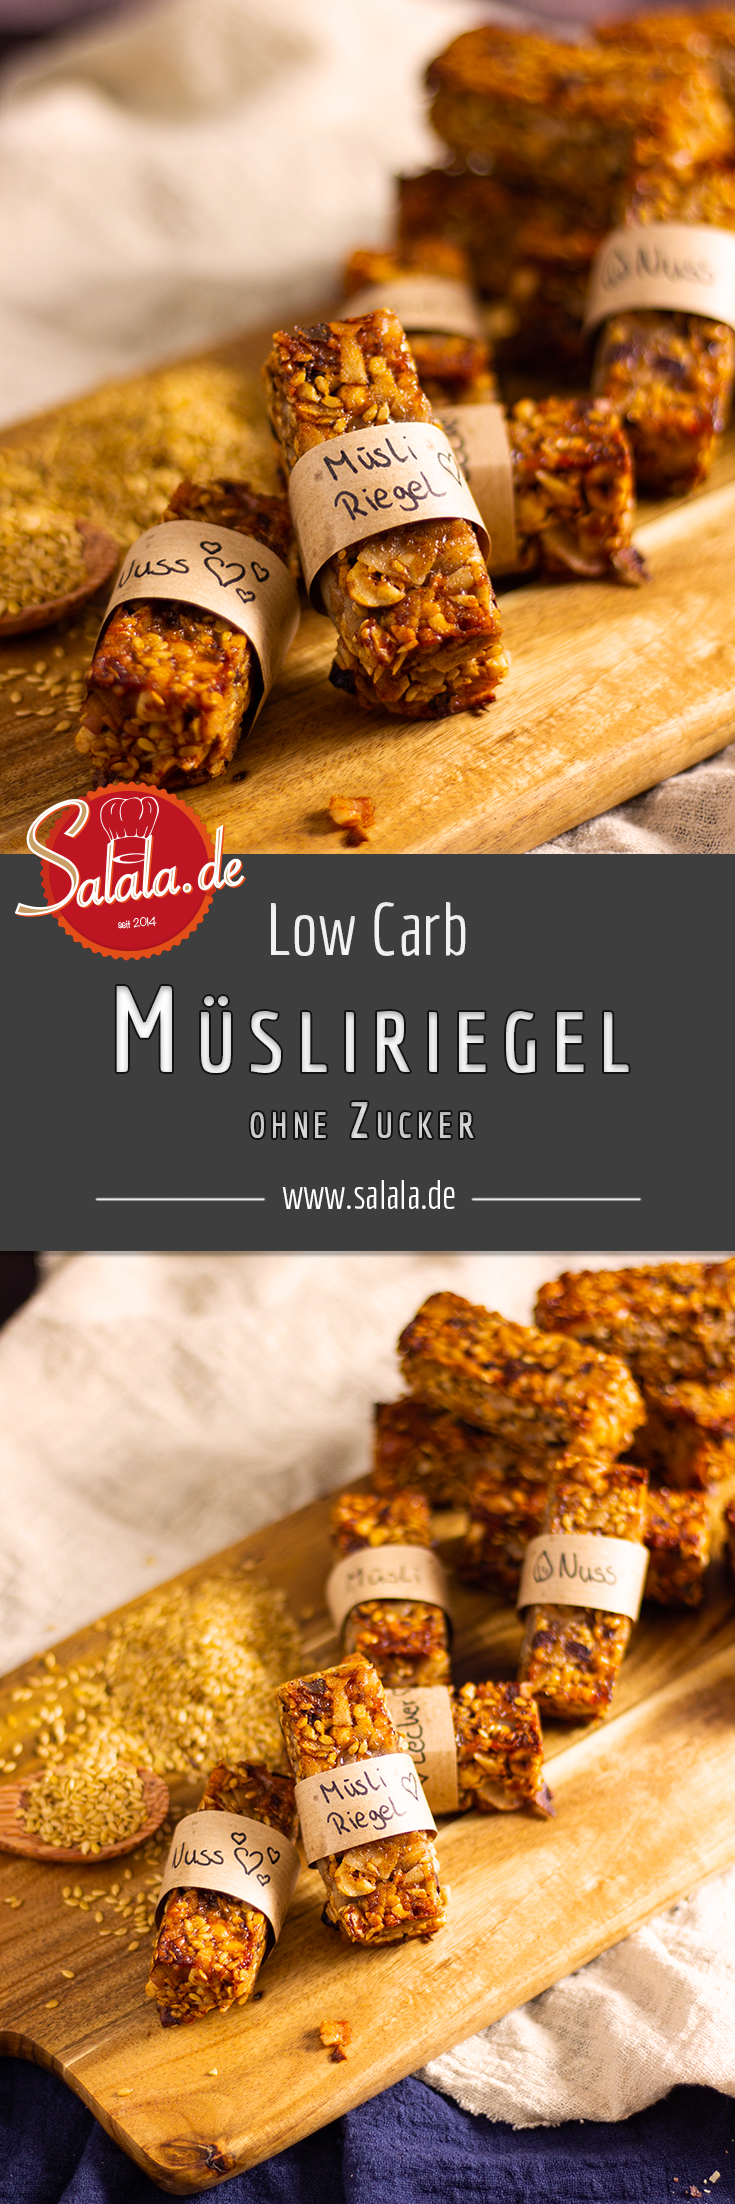 Müsliriegel ohne Getreide | salala.de – Low Carb mit Vroni & Nico #lowcarbdesserts